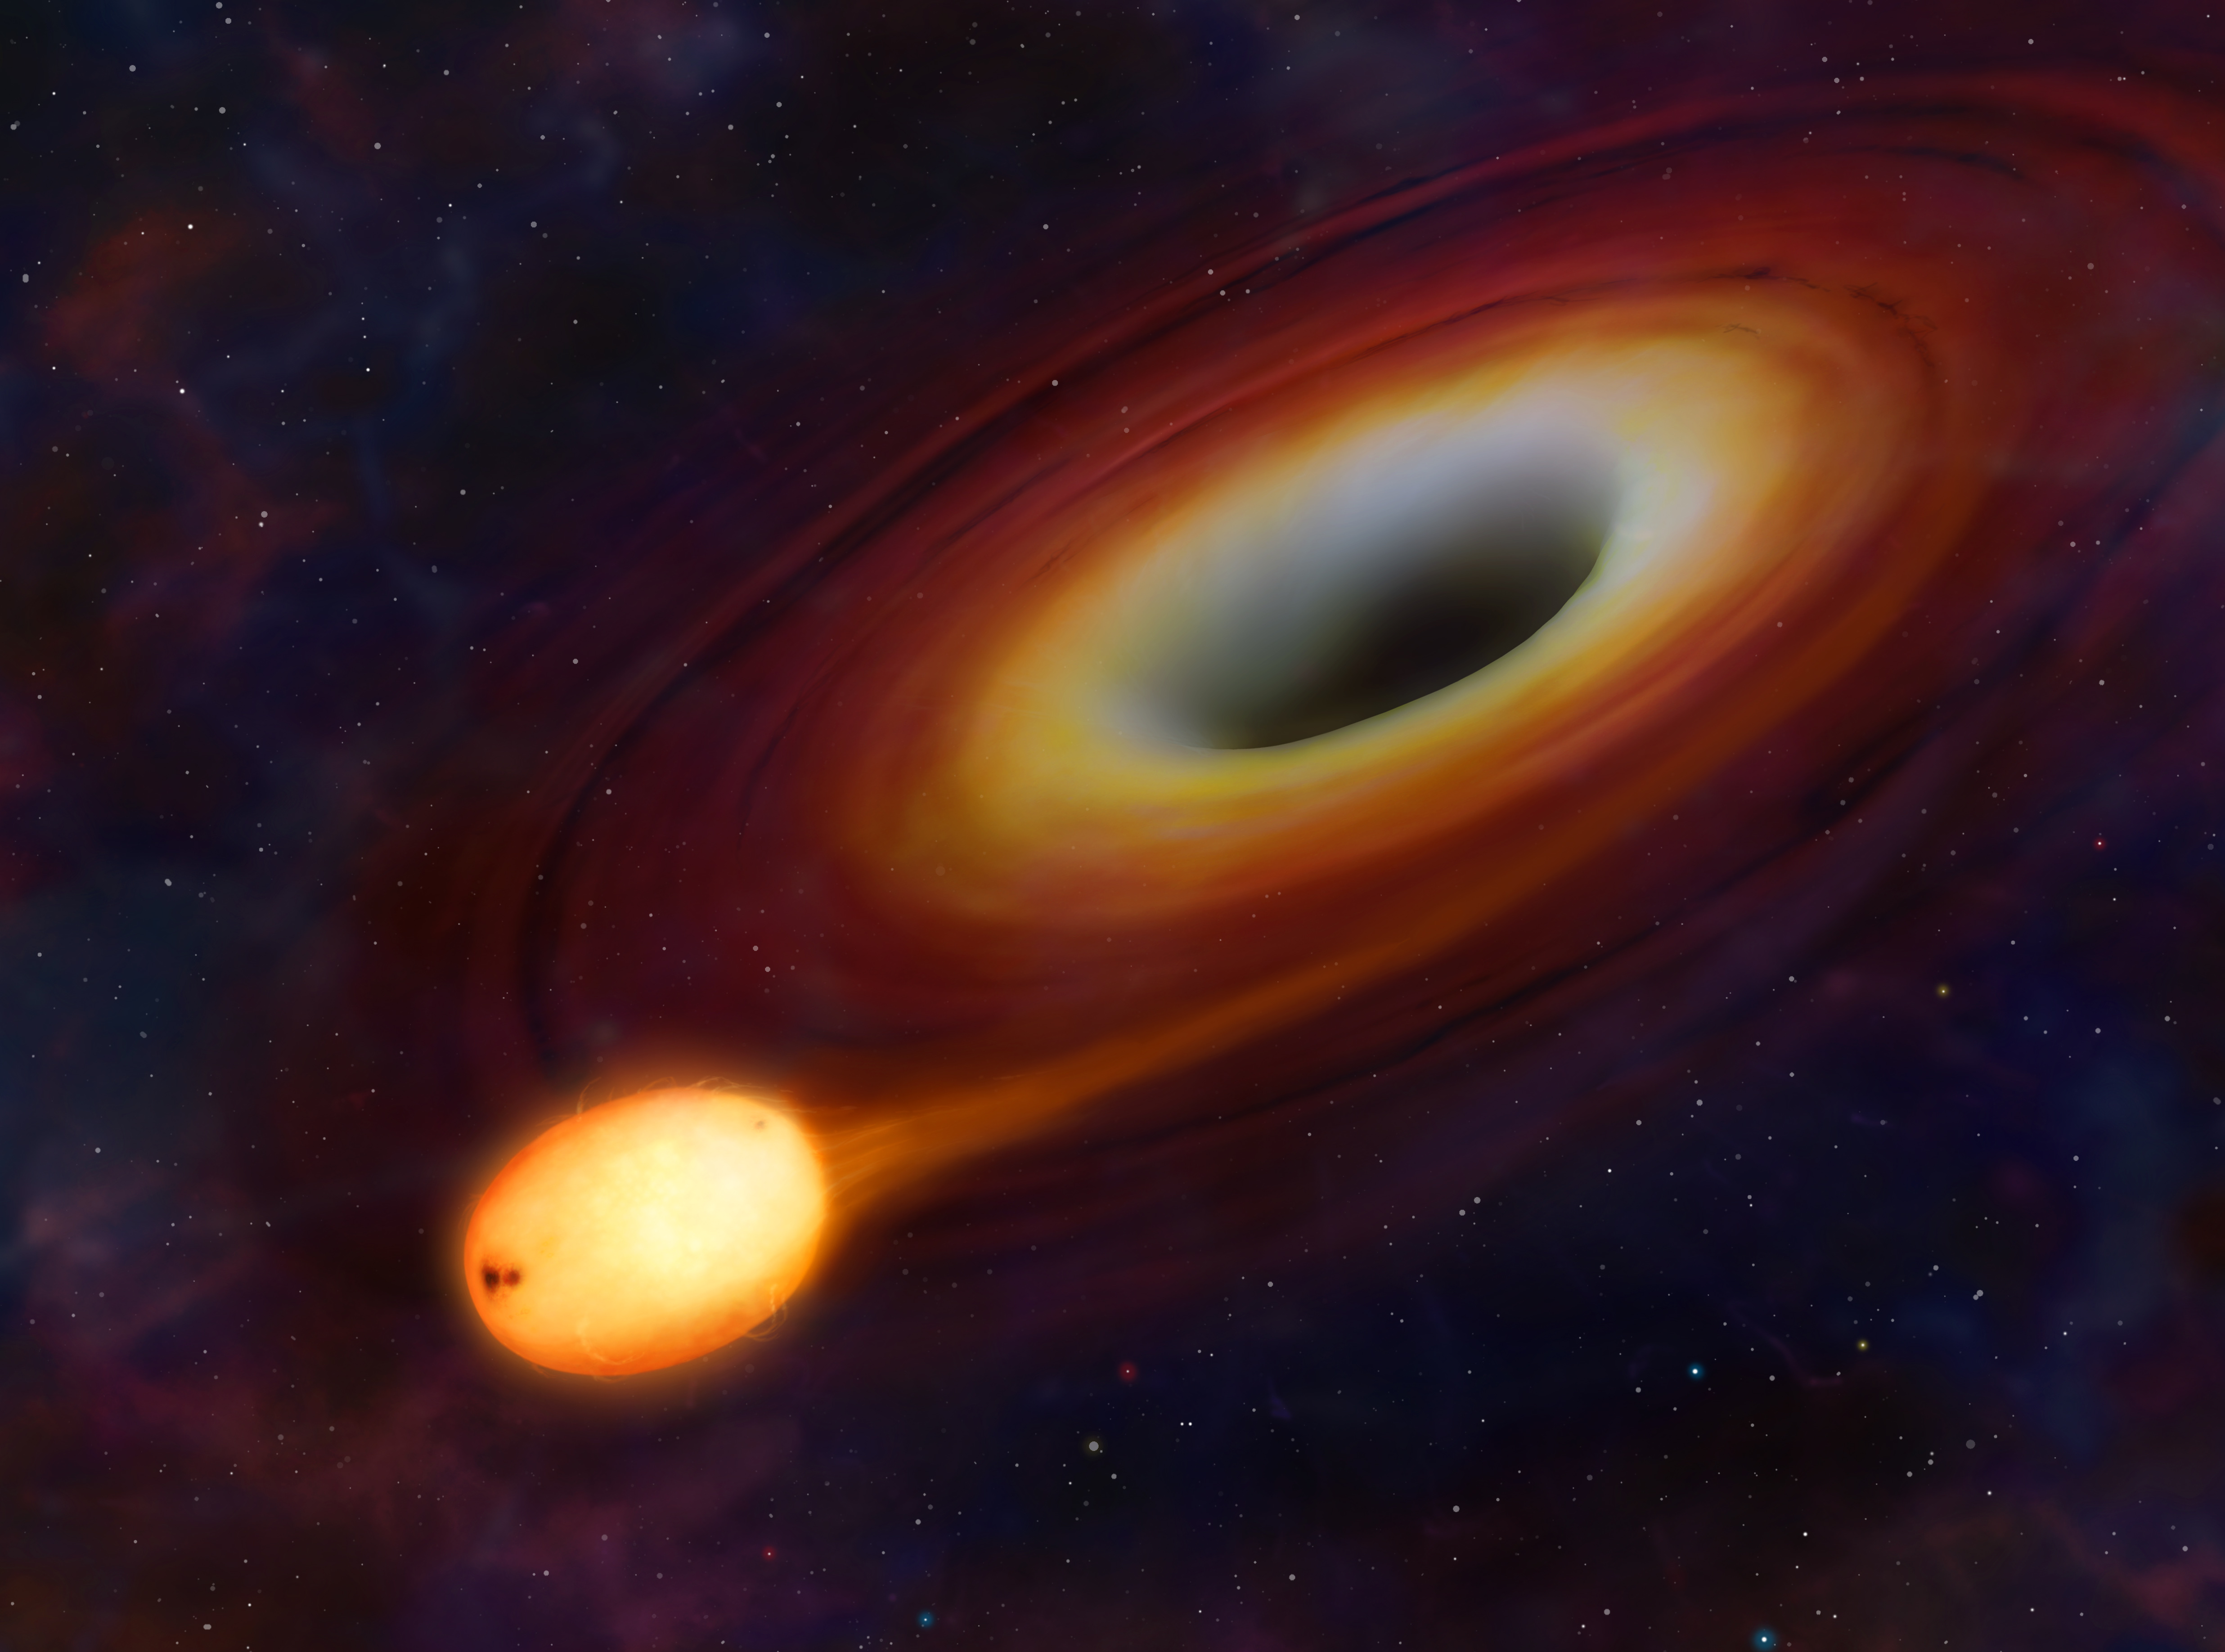 Black Hole 4k Ultra HD Wallpaper | Background Image ...